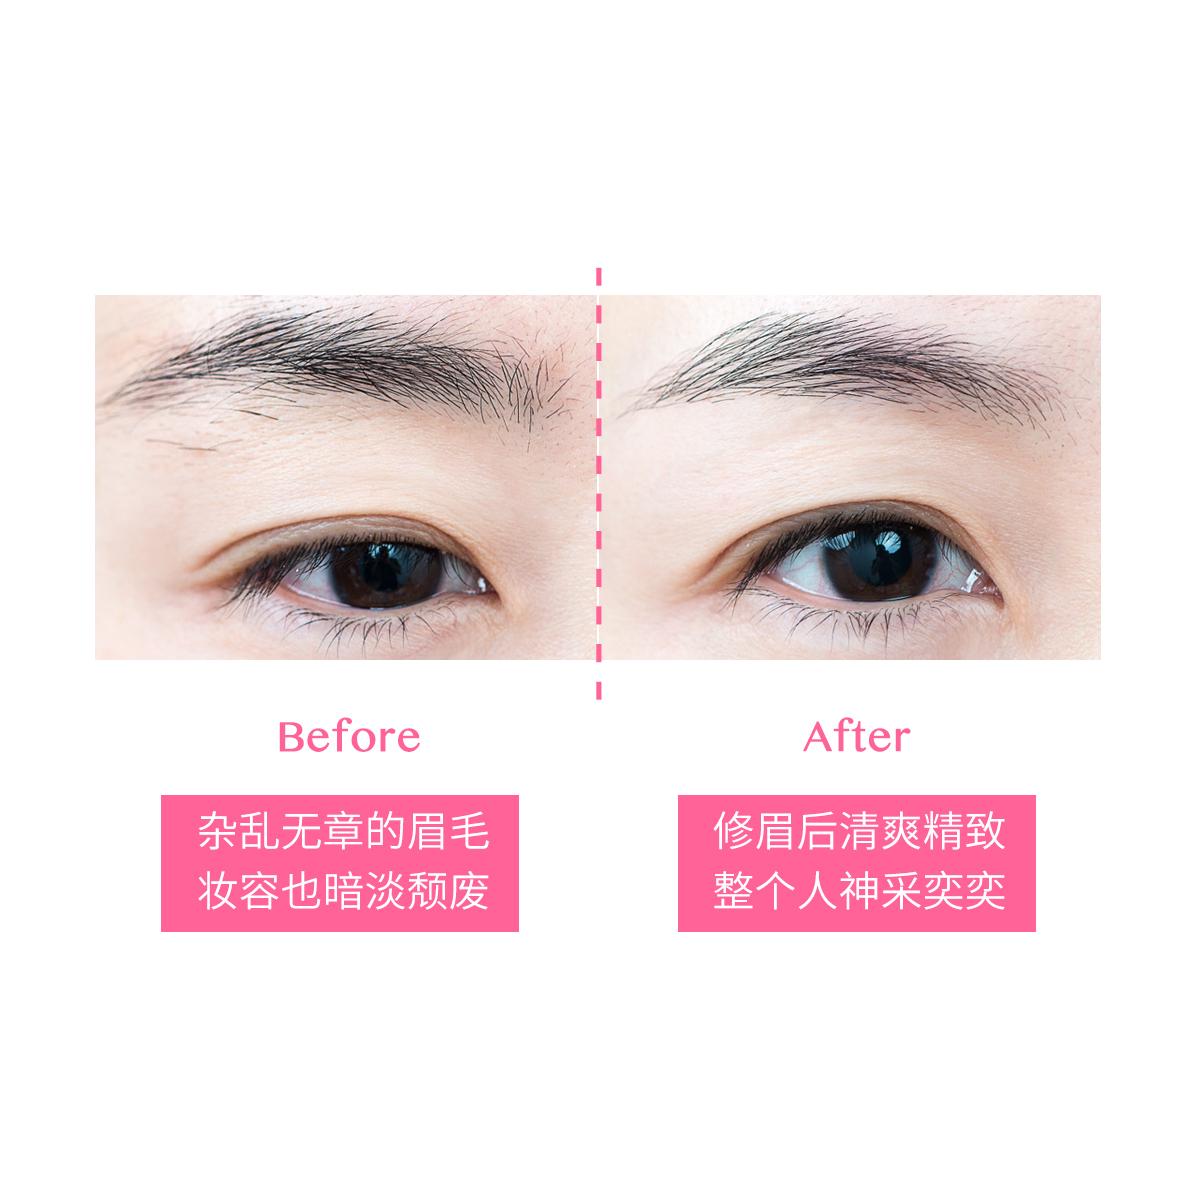 Japans Original Shiseido Eyebrow Knife Shaving Eyebrow Knife 3